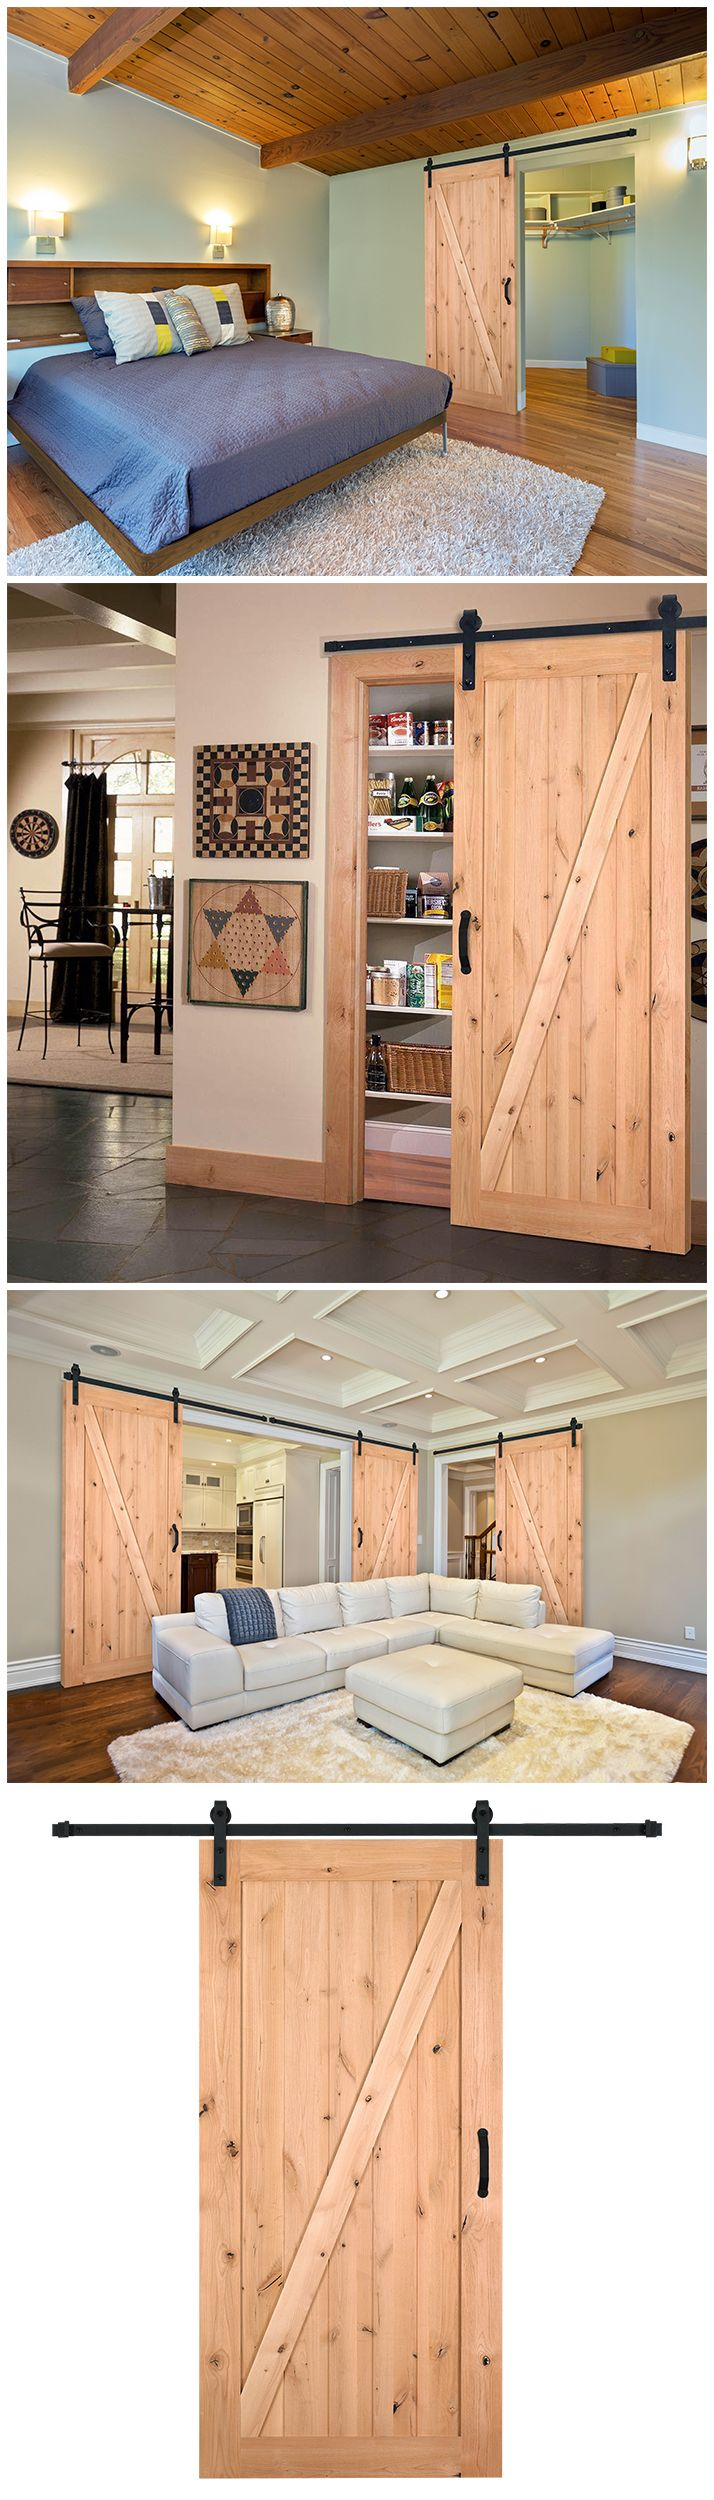 Masonite 42 In X 84 Z Bar Knotty Alder Wood Interior Barn Door Slab With Sliding Hardware Kit